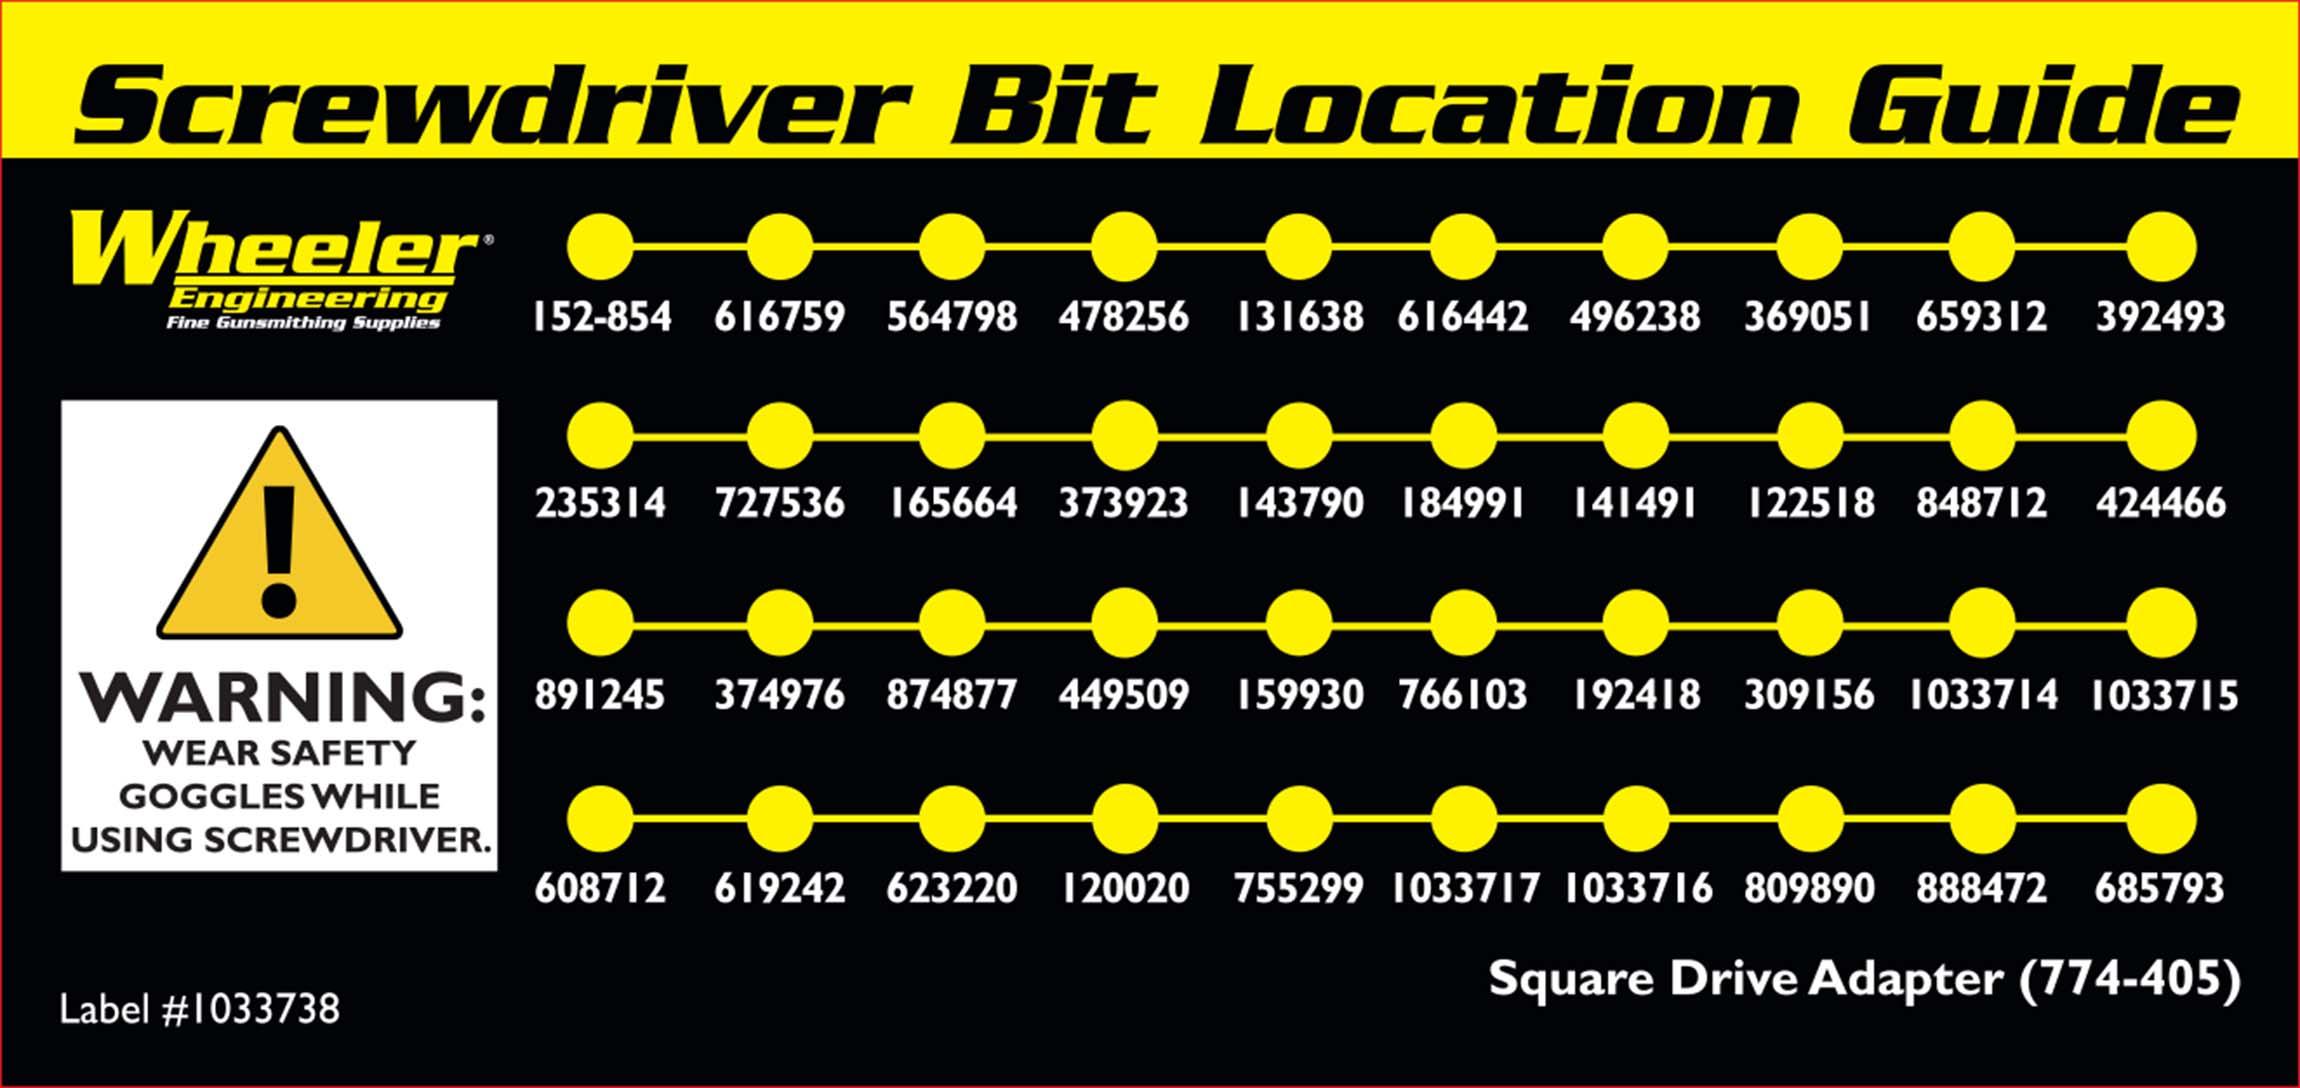 43 Piece Professional Gunsmithing Screwdriver Set - 954621 bit list